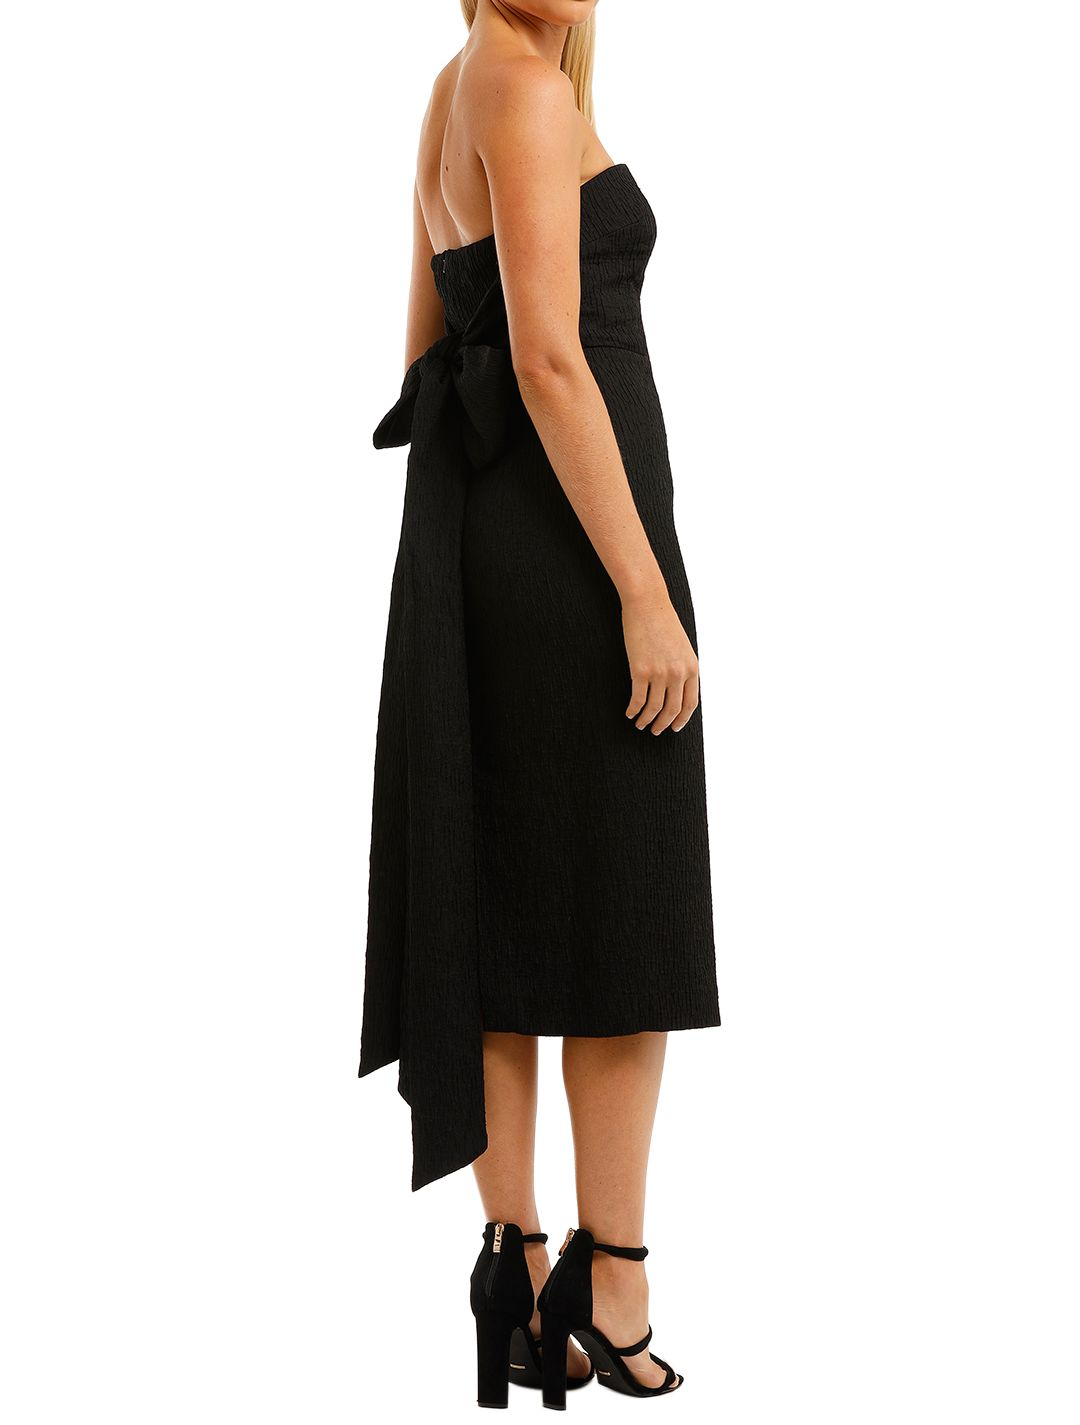 Rebecca-Vallance-Harlow-Dress-Black-BAck